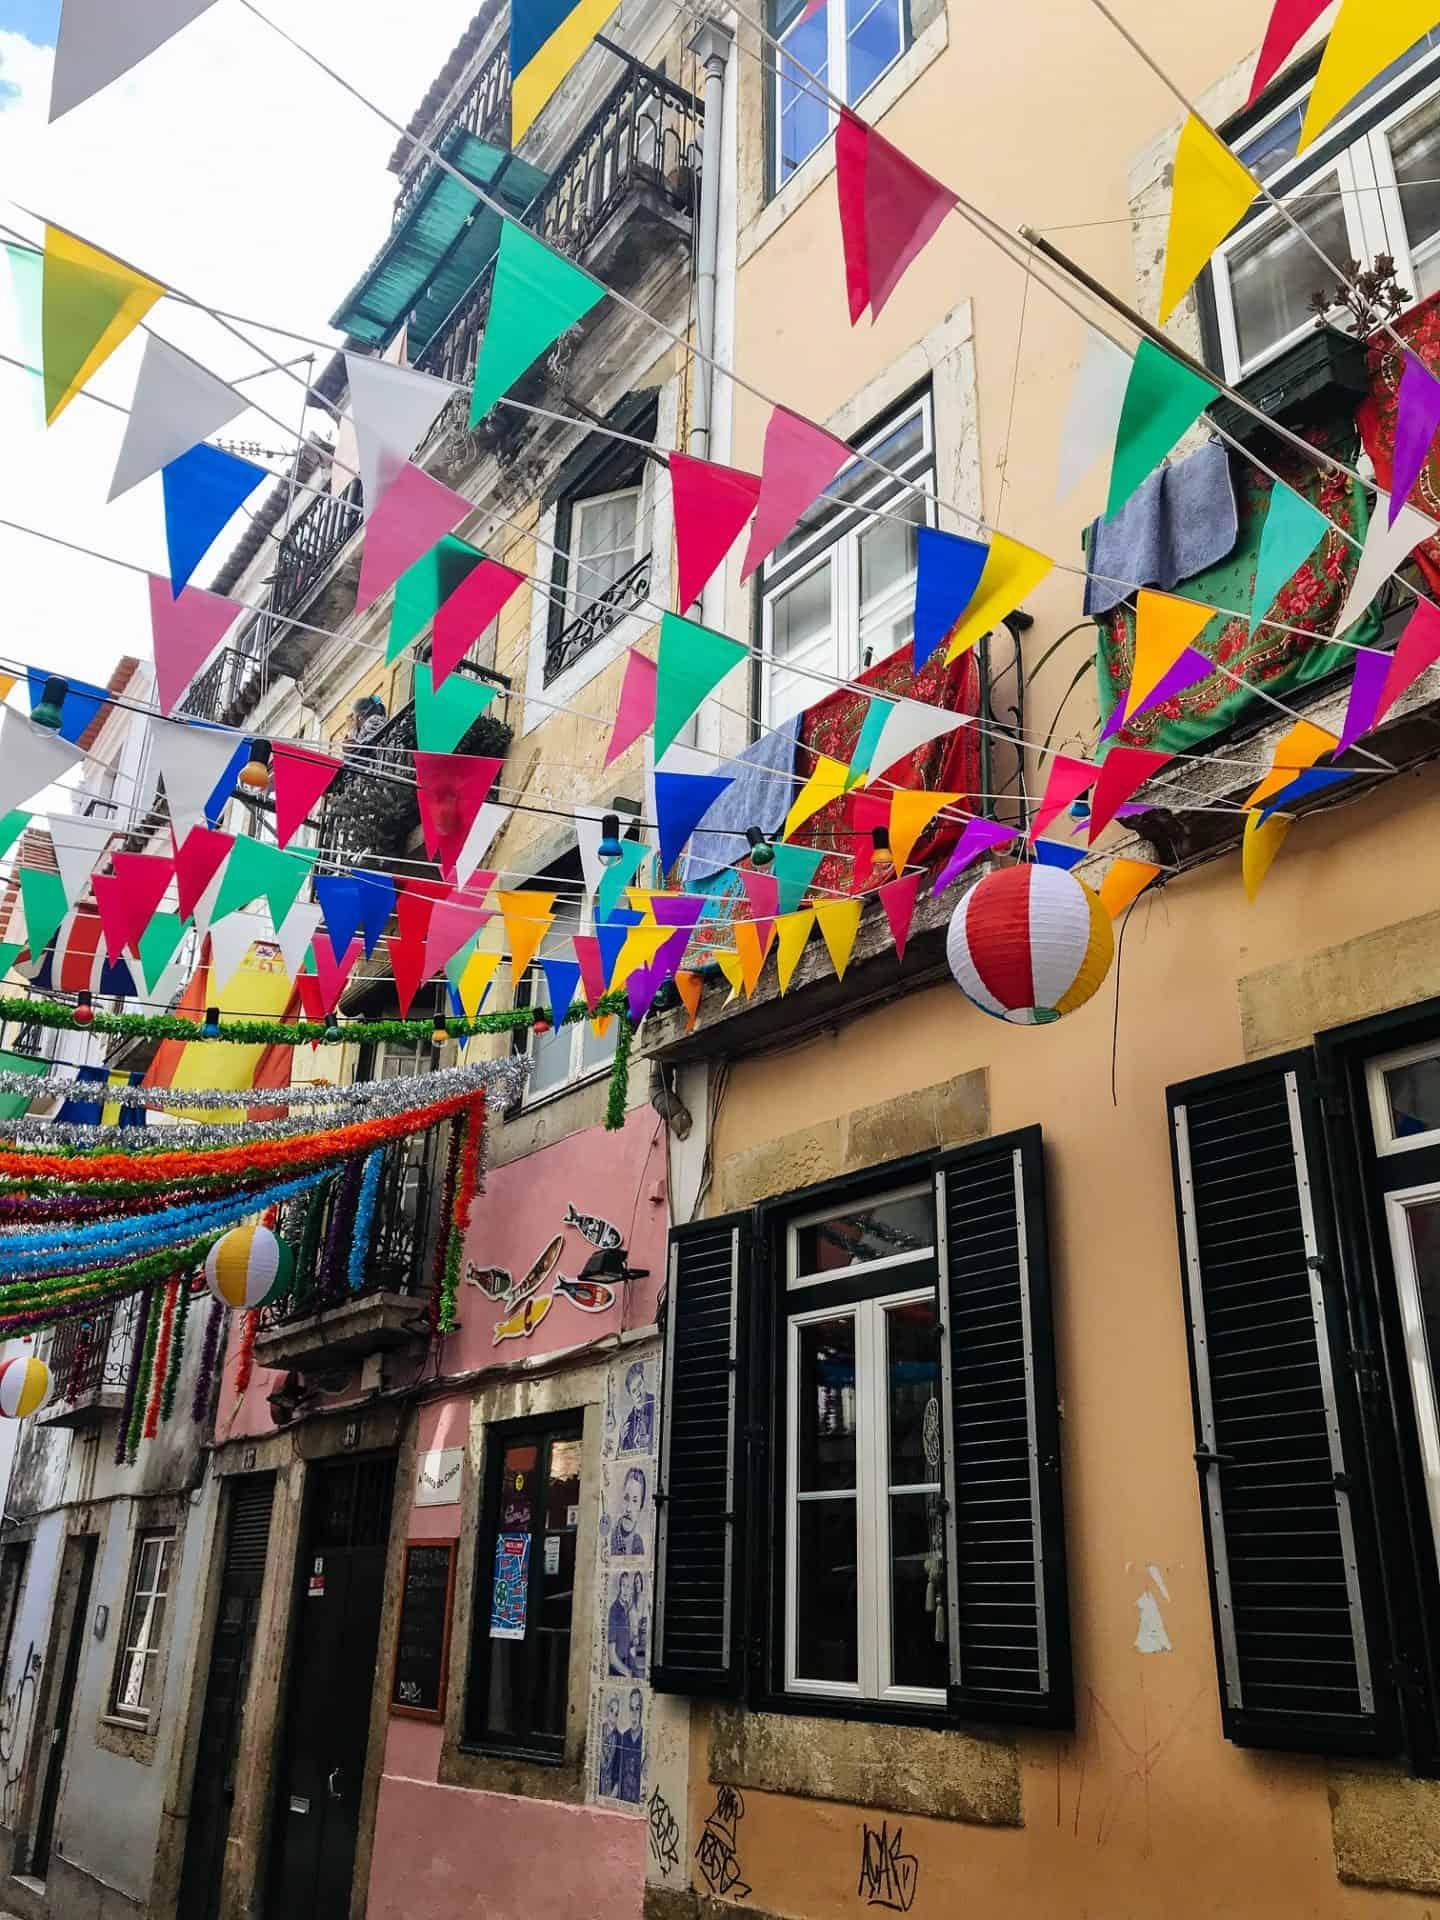 lisbon   portugal lisbon's lisbon portugal lisbon things to do at lisbon things to do in lisbon what to do in lisbon lisbon in portugal what to see lisbon what to see in lisbon best things to do lisbon lisbon to do things to see in lisbon attractions lisbon must see lisbon things to see lisbon top things to do lisbon attractions in lisbon lisbon attractions lisbon things to do places to visit in lisbon places to visit lisbon points of interest in lisbon points of interest lisbon best thing to do in lisbon lisbon sights to see lisbon what to do sightseeing lisbon things to do in lisbon portugal lisbon must see lisbon what to see top things to do in lisbon sightseeing in lisbon lisbon sightseeing must see in lisbon sights to see in lisbon lisbon portugal things to do lisbon is where best things to do in lisbon lisbon sights sights in lisbon things to do lisbon lisbon tourist attractions tourist attraction in lisbon tourist attractions in lisbon tourist attractions lisbon where lisbon where is lisbon best places to visit lisbon must do in lisbon sights lisbon lisbon top attractions sights of lisbon portugal lisbon best of lisbon lisbon top 10 things to see in portugal lisbon top 10 things to do in lisbon what to do in lisbon portugal what to do in portugal lisbon what is lisbon famous for things to do portugal lisbon spain things to do in lisbon february what to see in lisbon portugal lisbon sites top 10 lisbon best things to do in lisbon portugal lisbon portugal attractions top sights in lisbon must do lisbon what to do and see in lisbon fun things to do in lisbon highlights of lisbon what to do lisbon portugal things to do in portugal best places in lisbon lisbon portugal tourist attractions must dos in lisbon what is lisbon known for places to see in lisbon to do in lisbon what is there to do in lisbon what to do in lisbon today